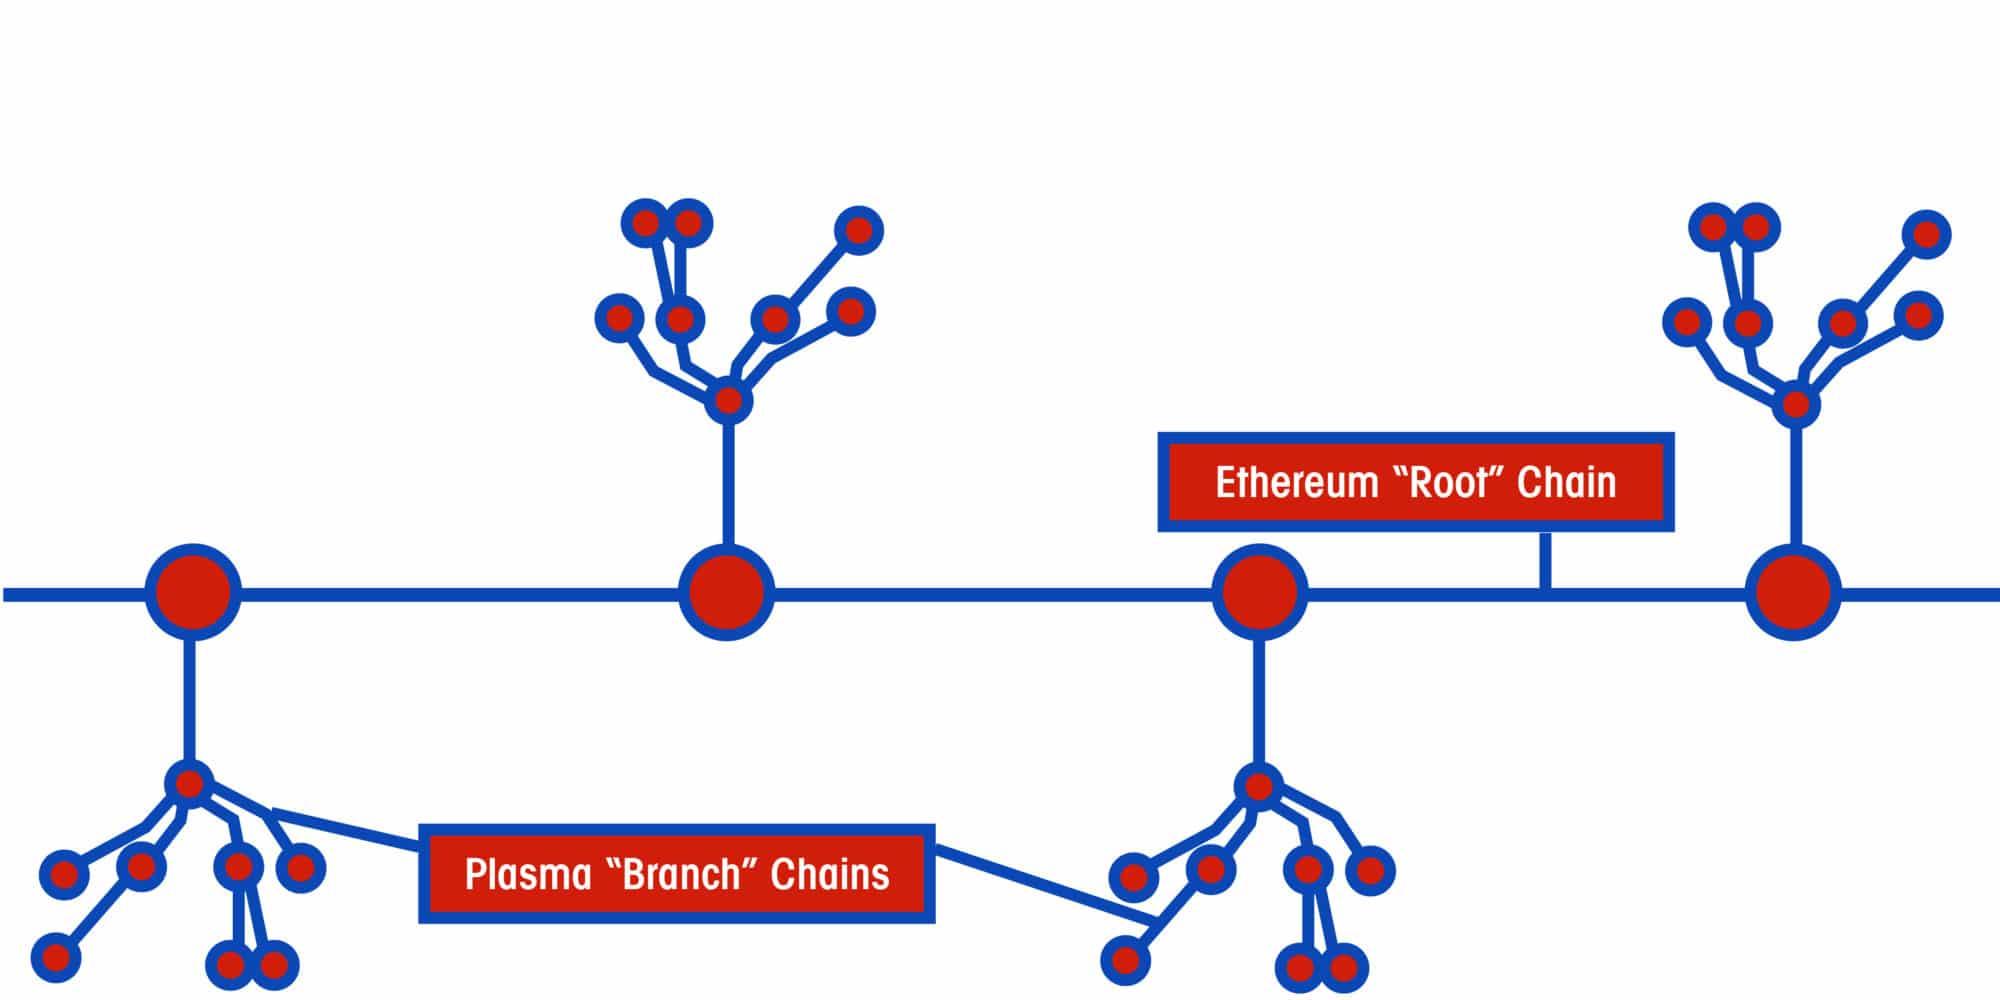 https://coincentral.com/plasma-an-innovative-framework-to-scale-ethereum